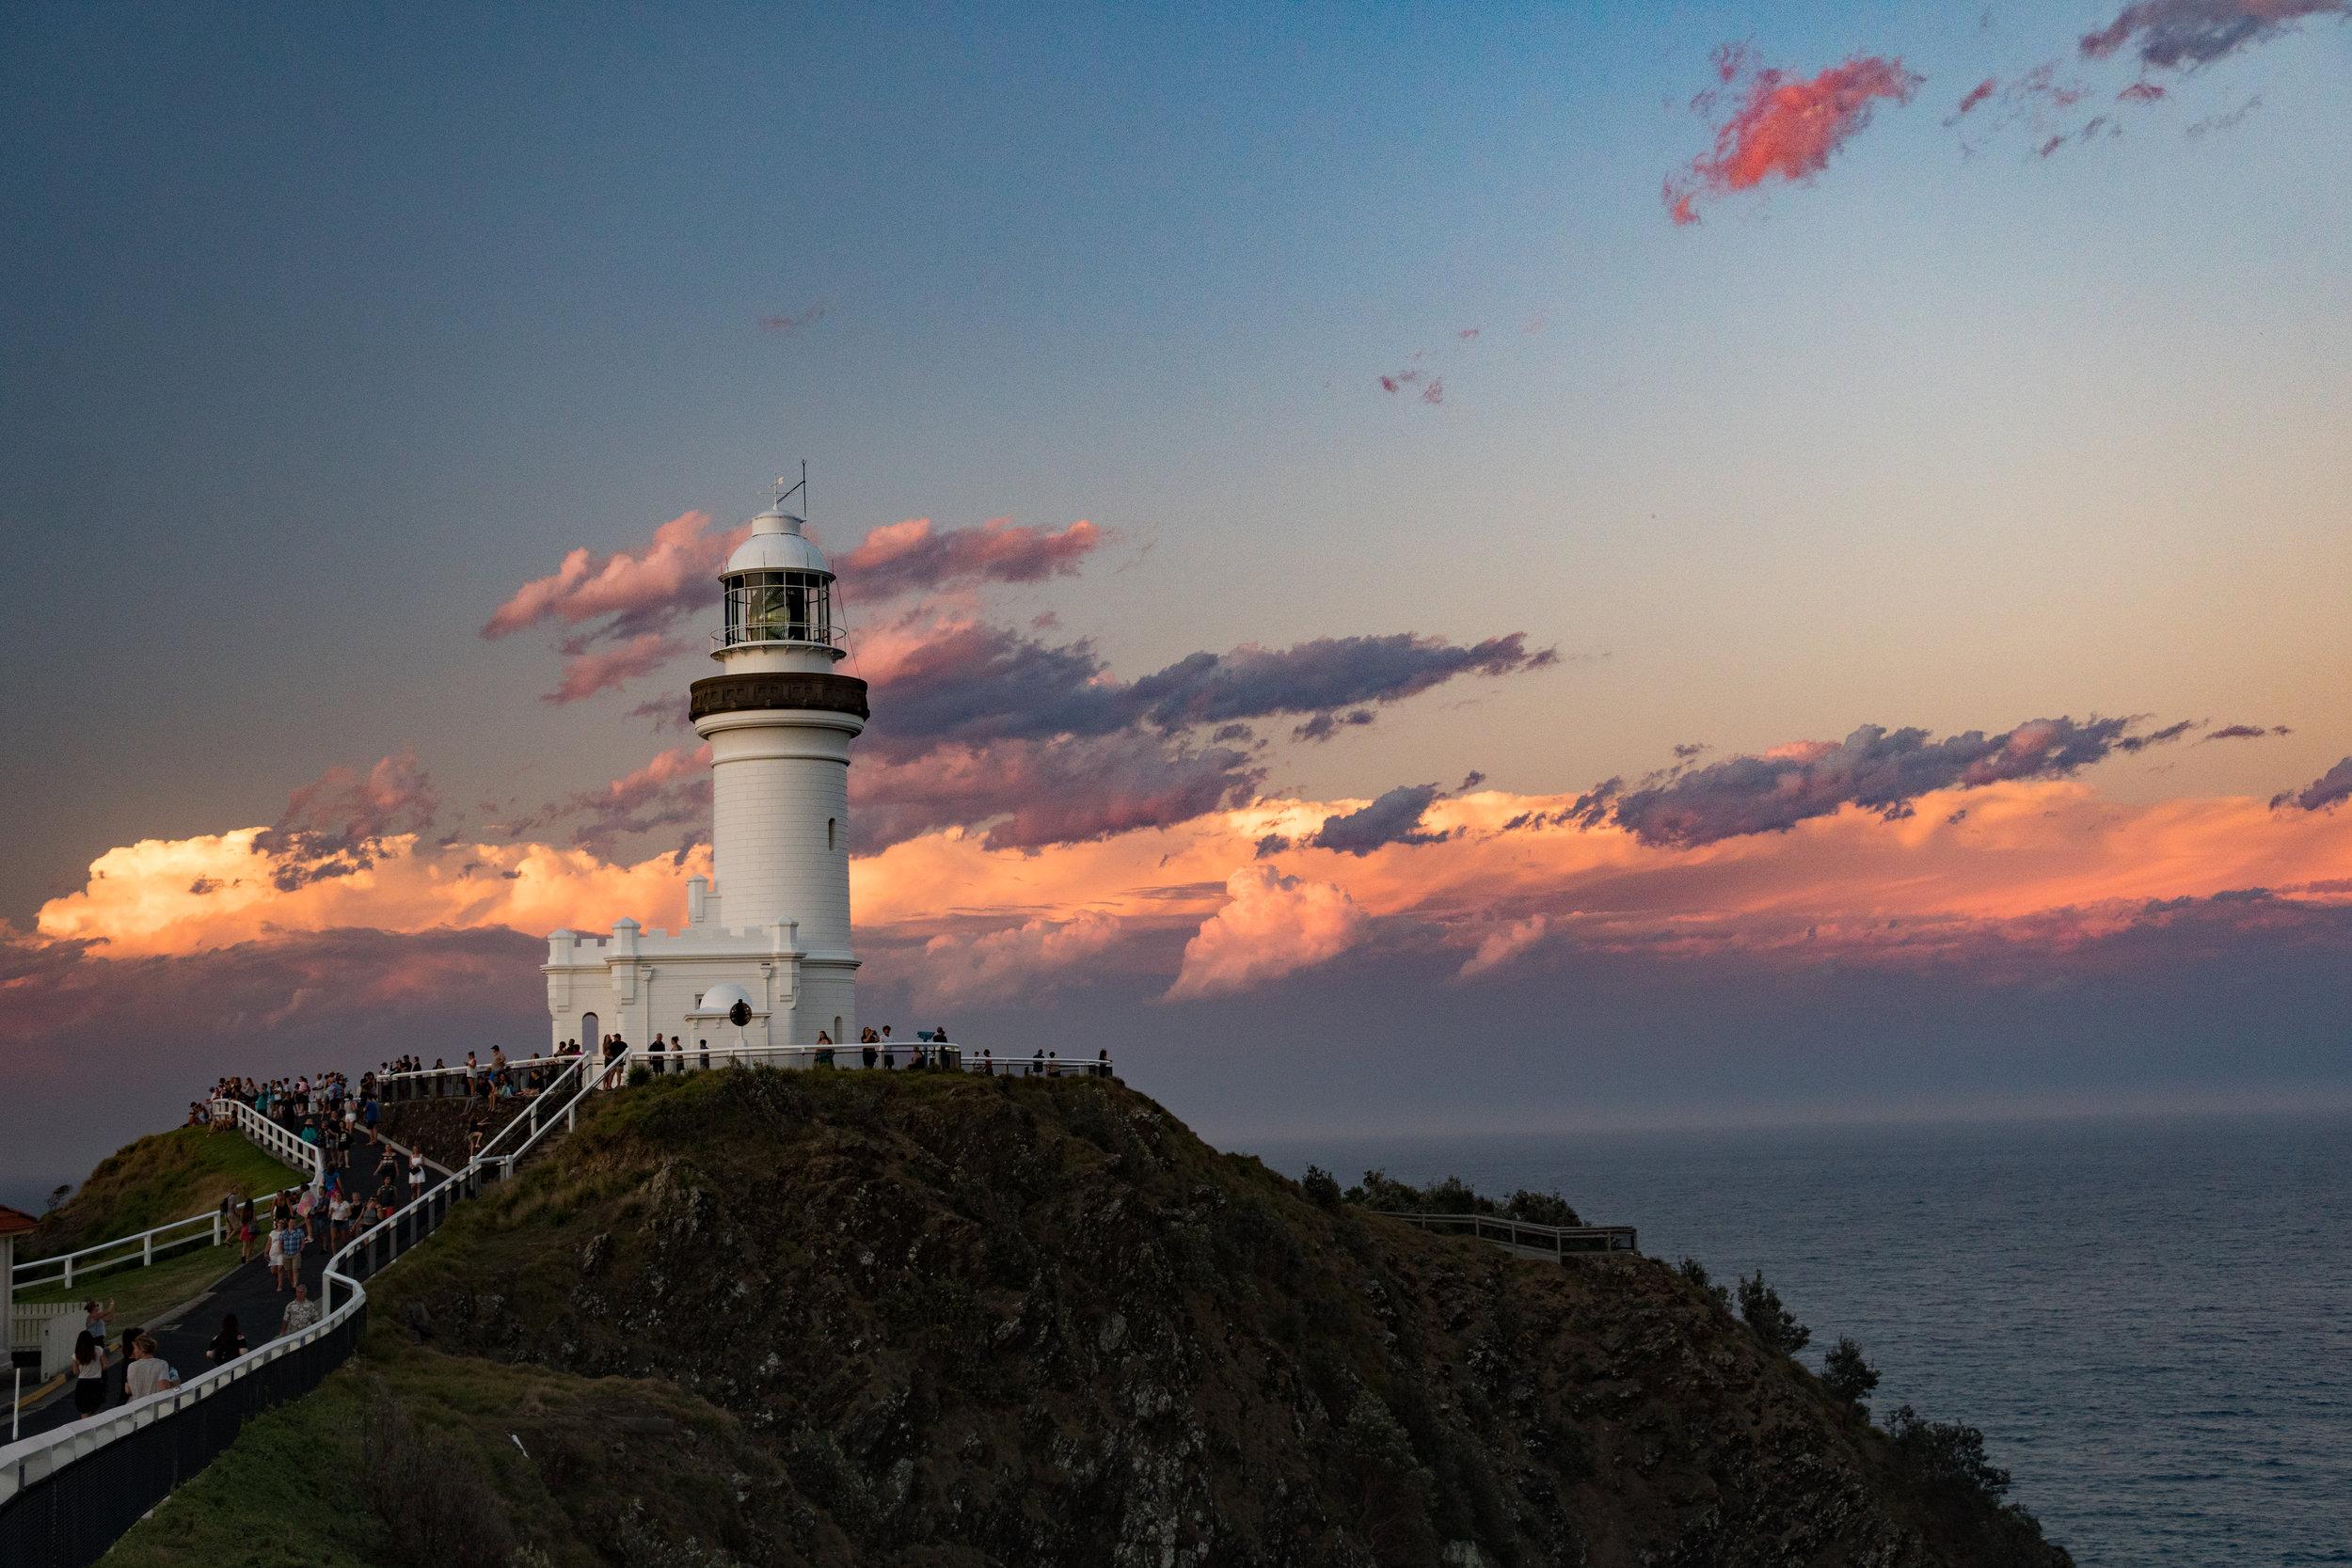 Sunset at Byron Bay Lighthouse